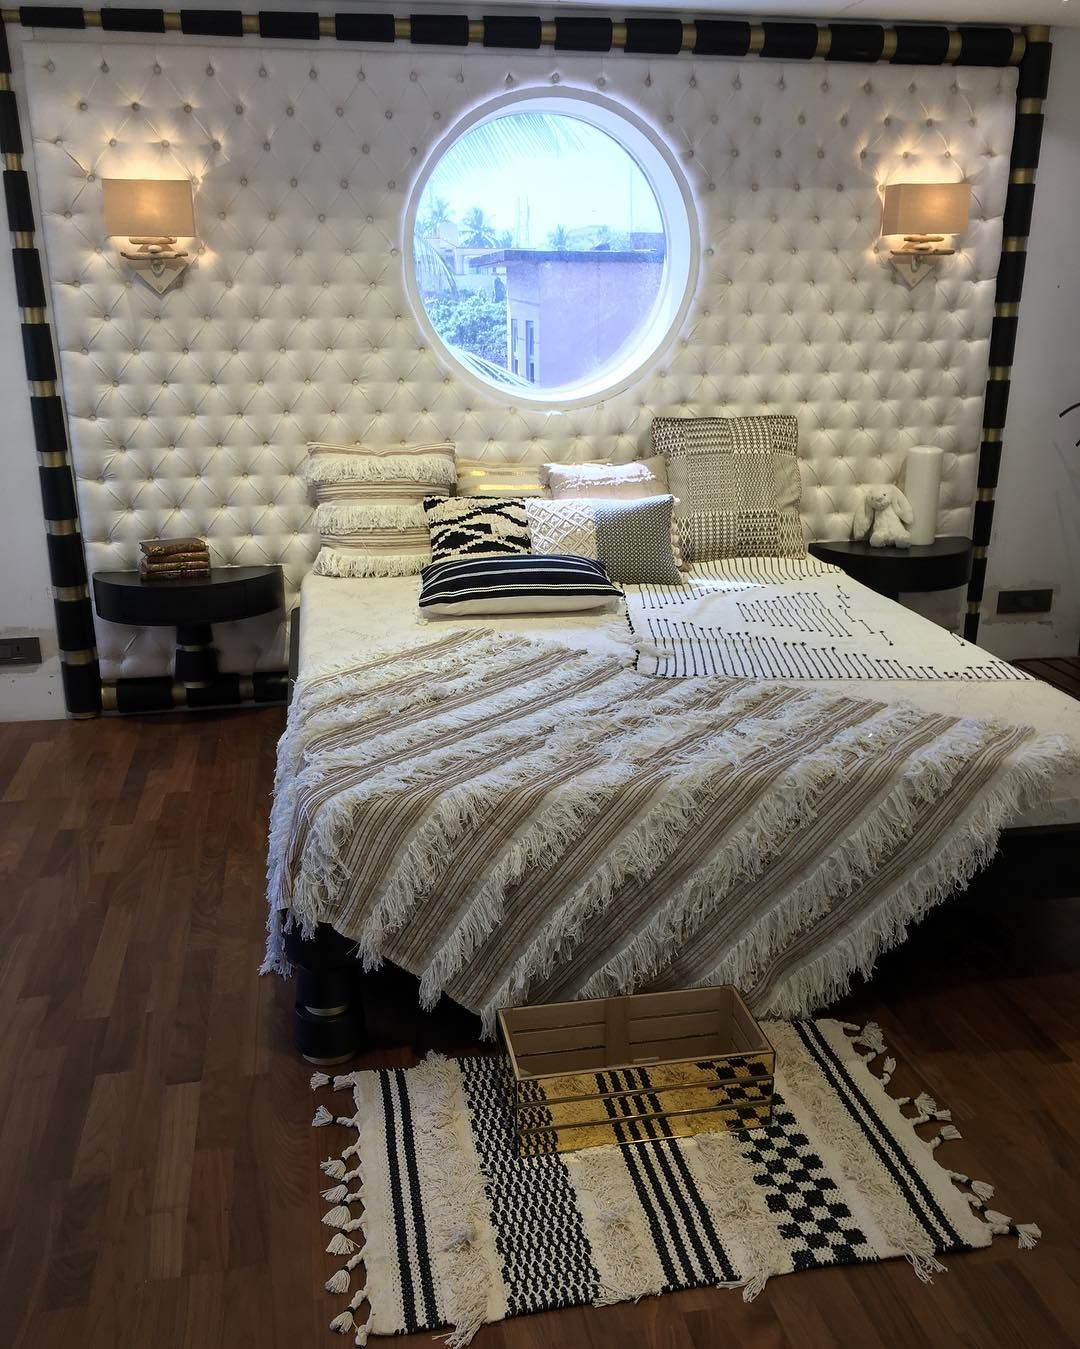 Decor Bed Cushions Throws Walllights By Gaurikhan Bed Cushions